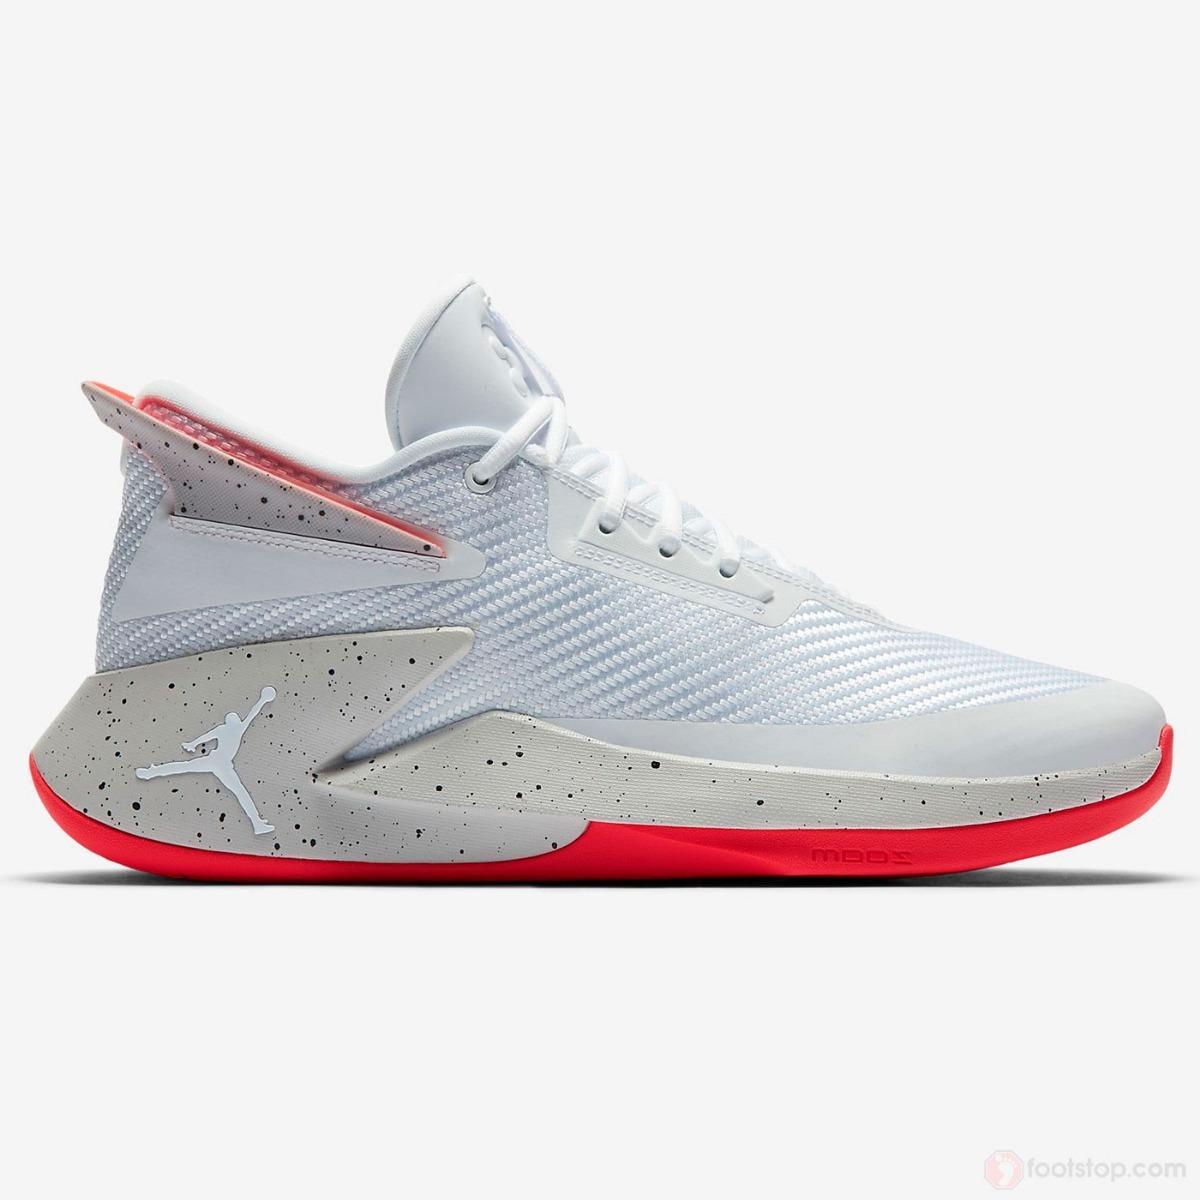 92229aceb2679 zapatillas jordan fly lockdown basketball. Cargando zoom.